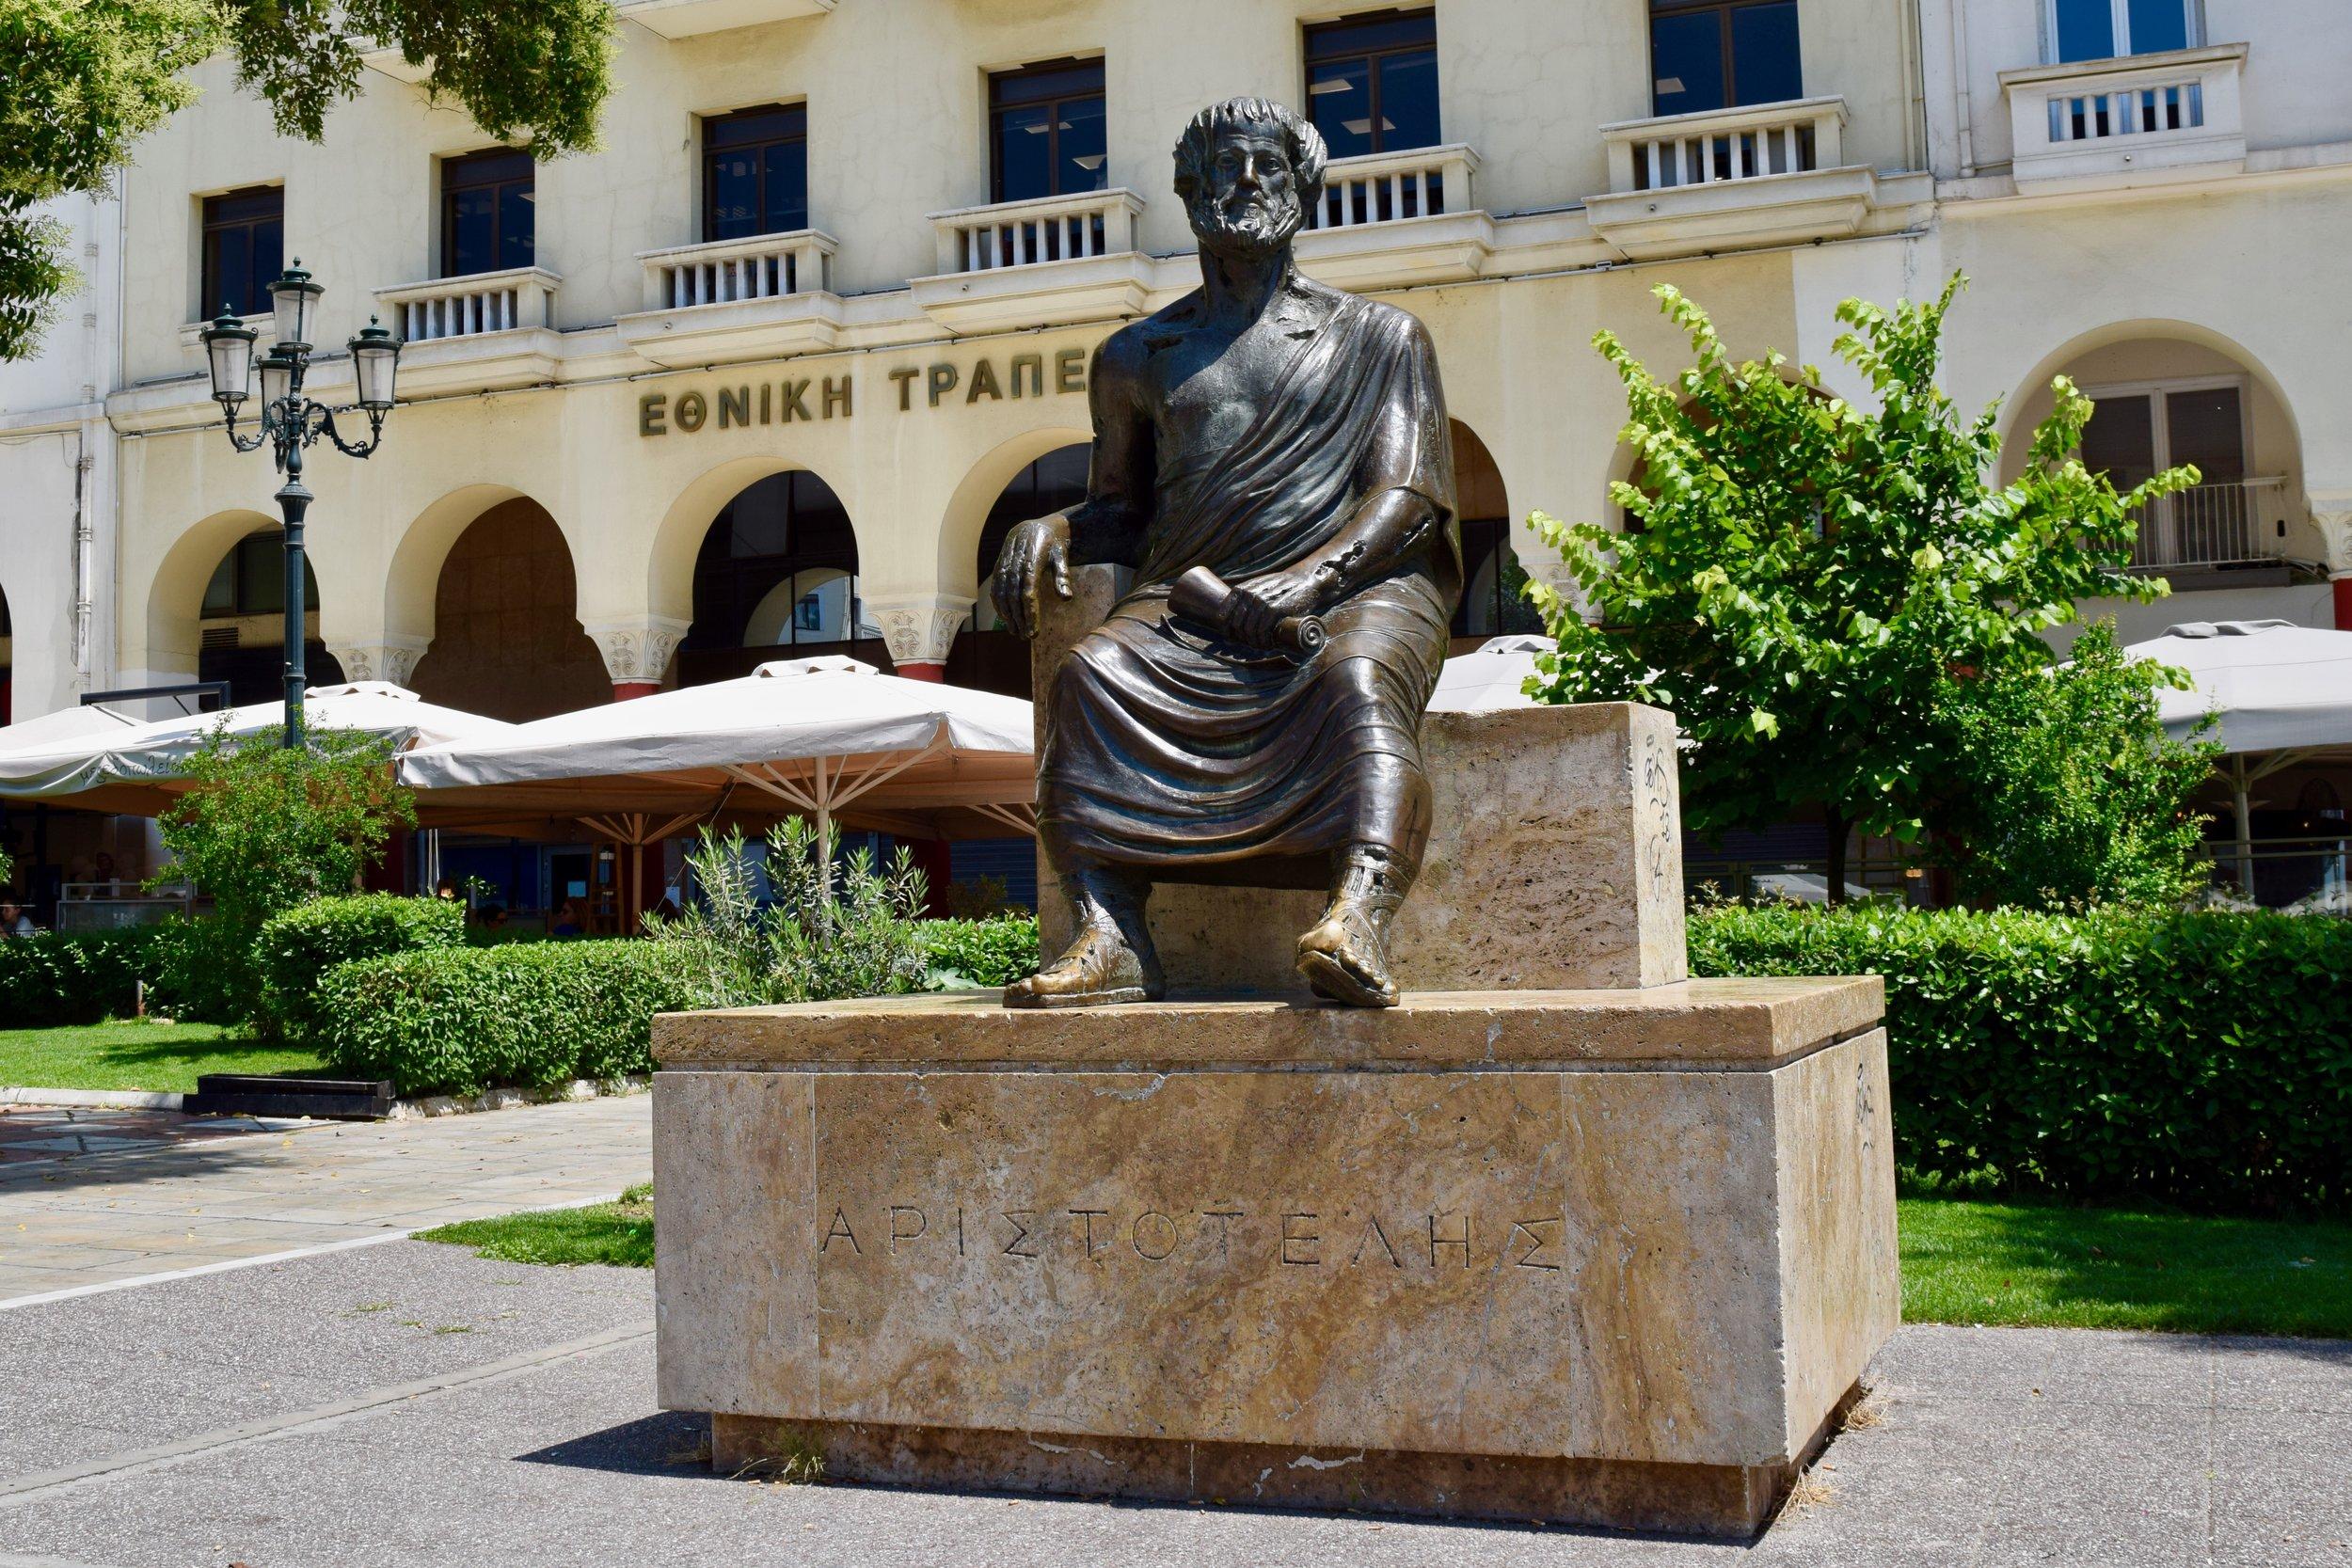 Statue of Aristotles